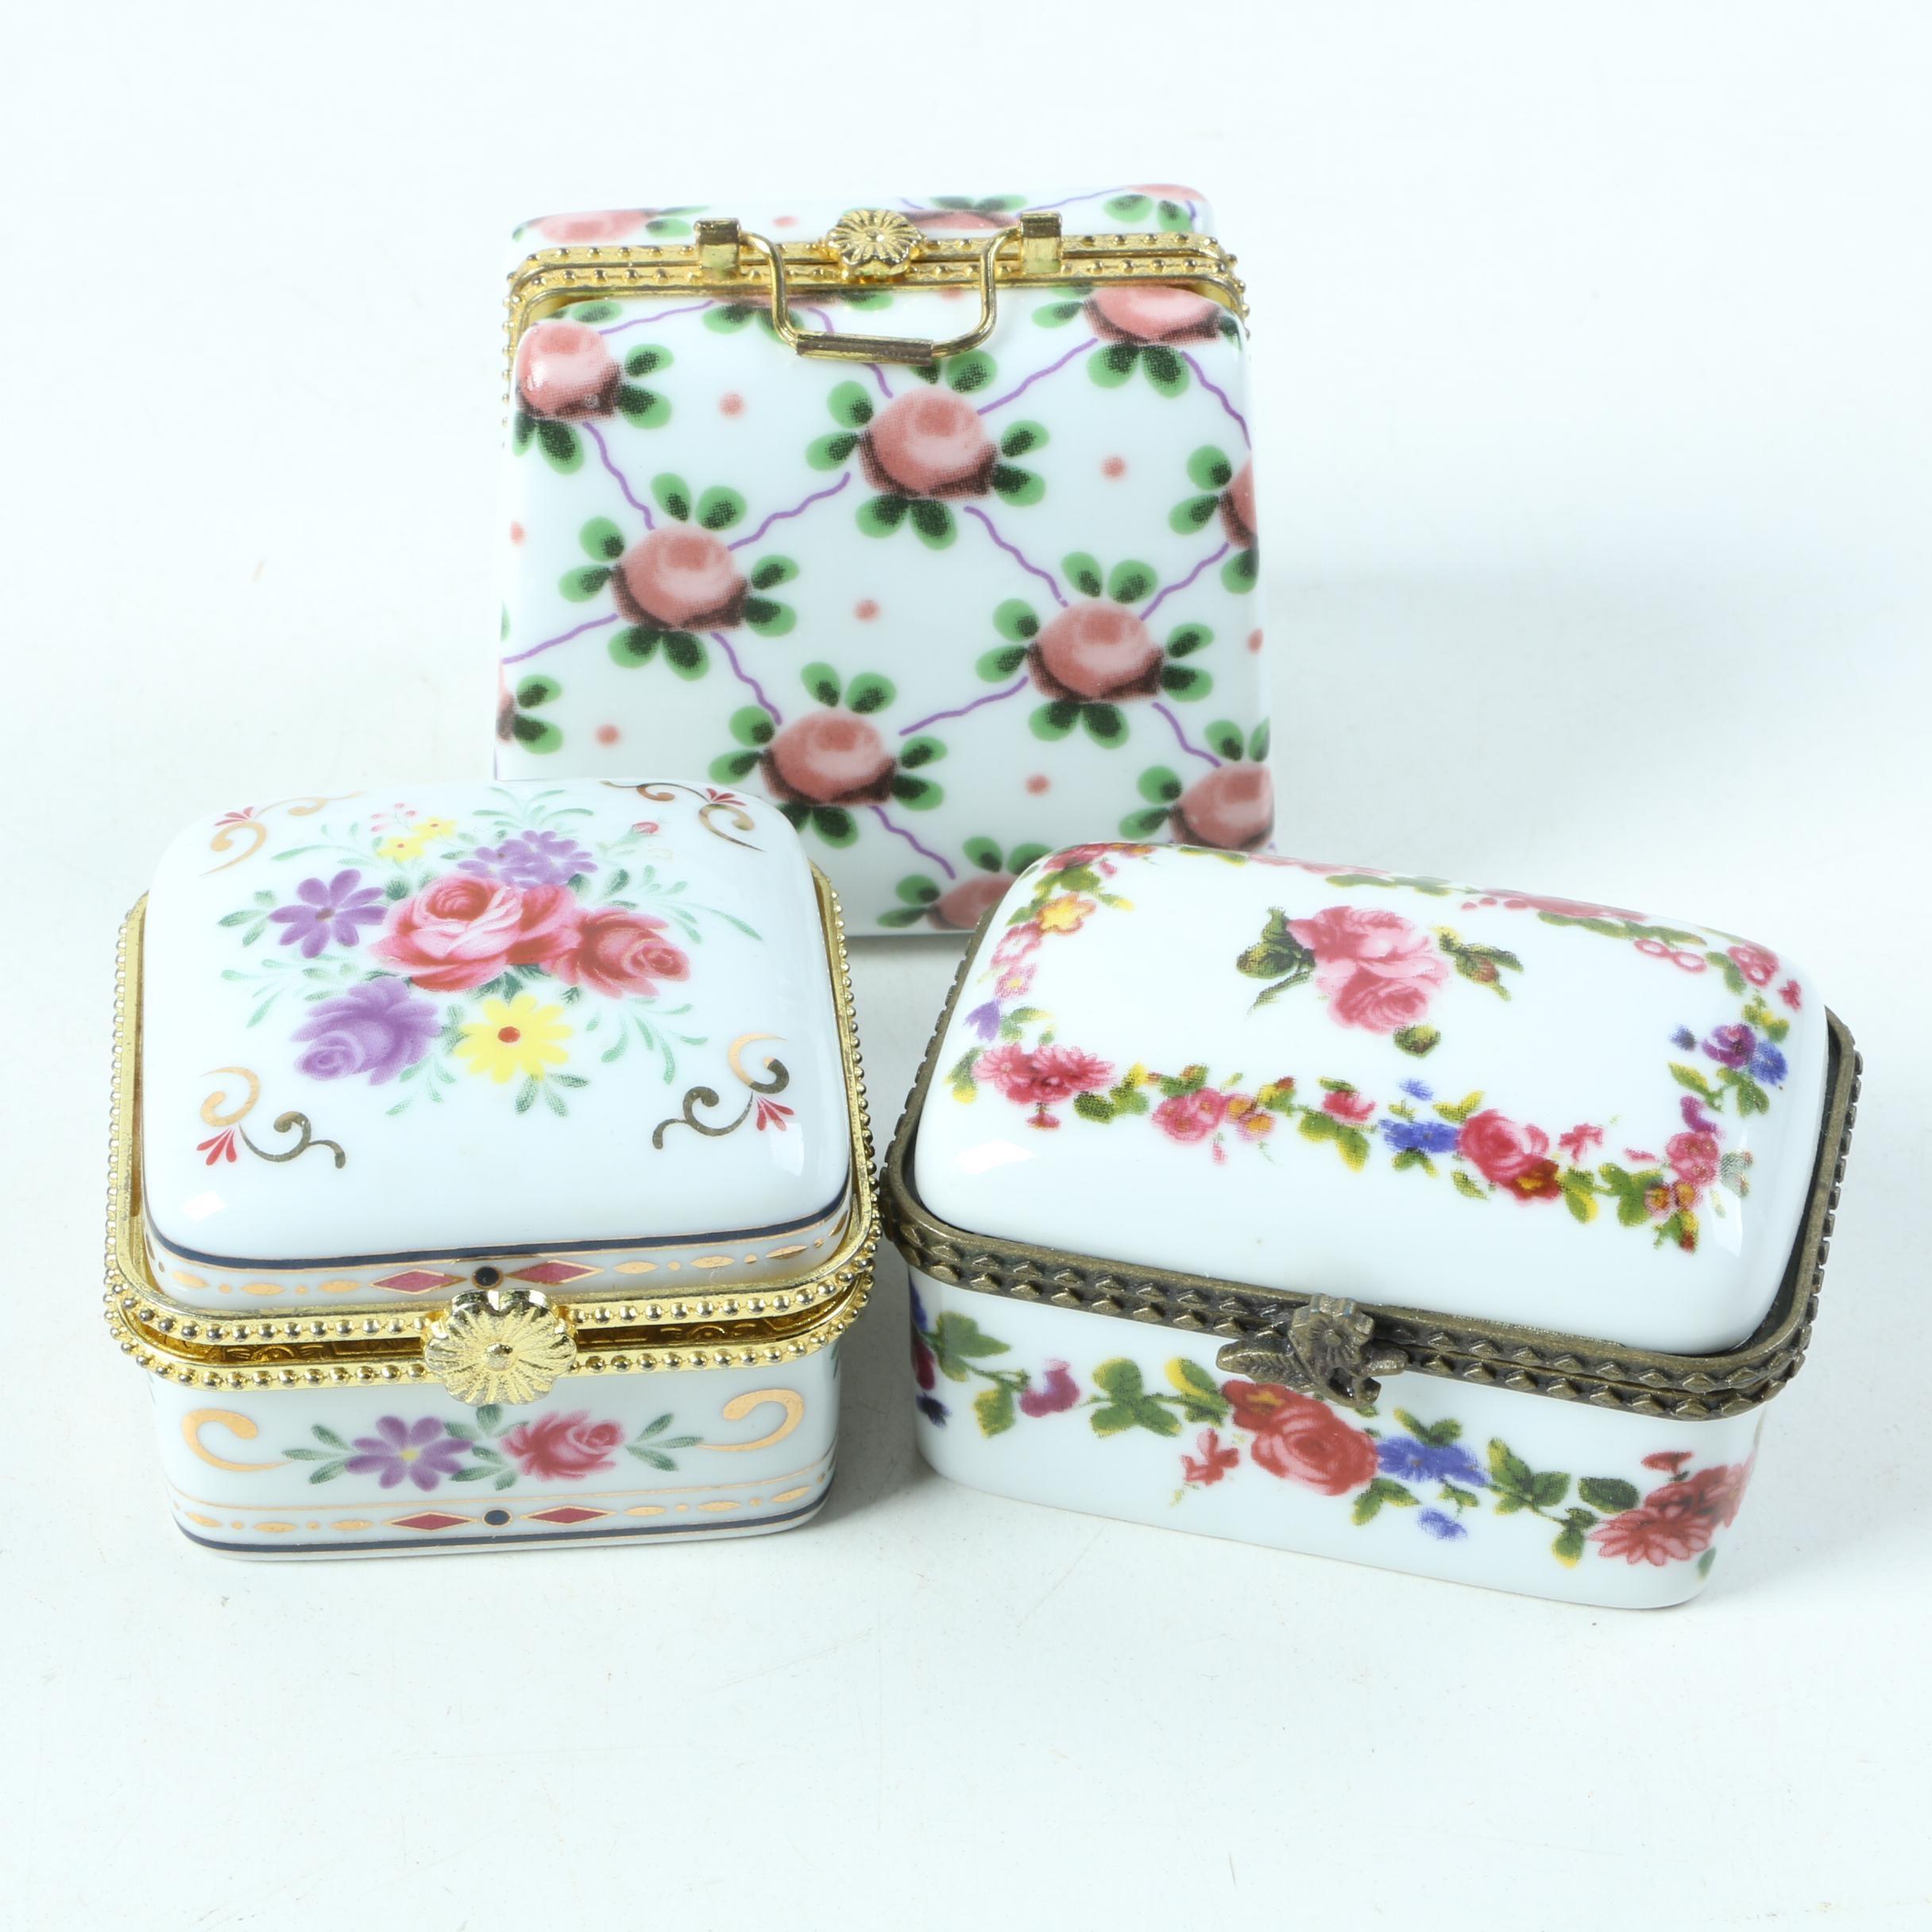 Floral Motif Porcelain Trinket Boxes